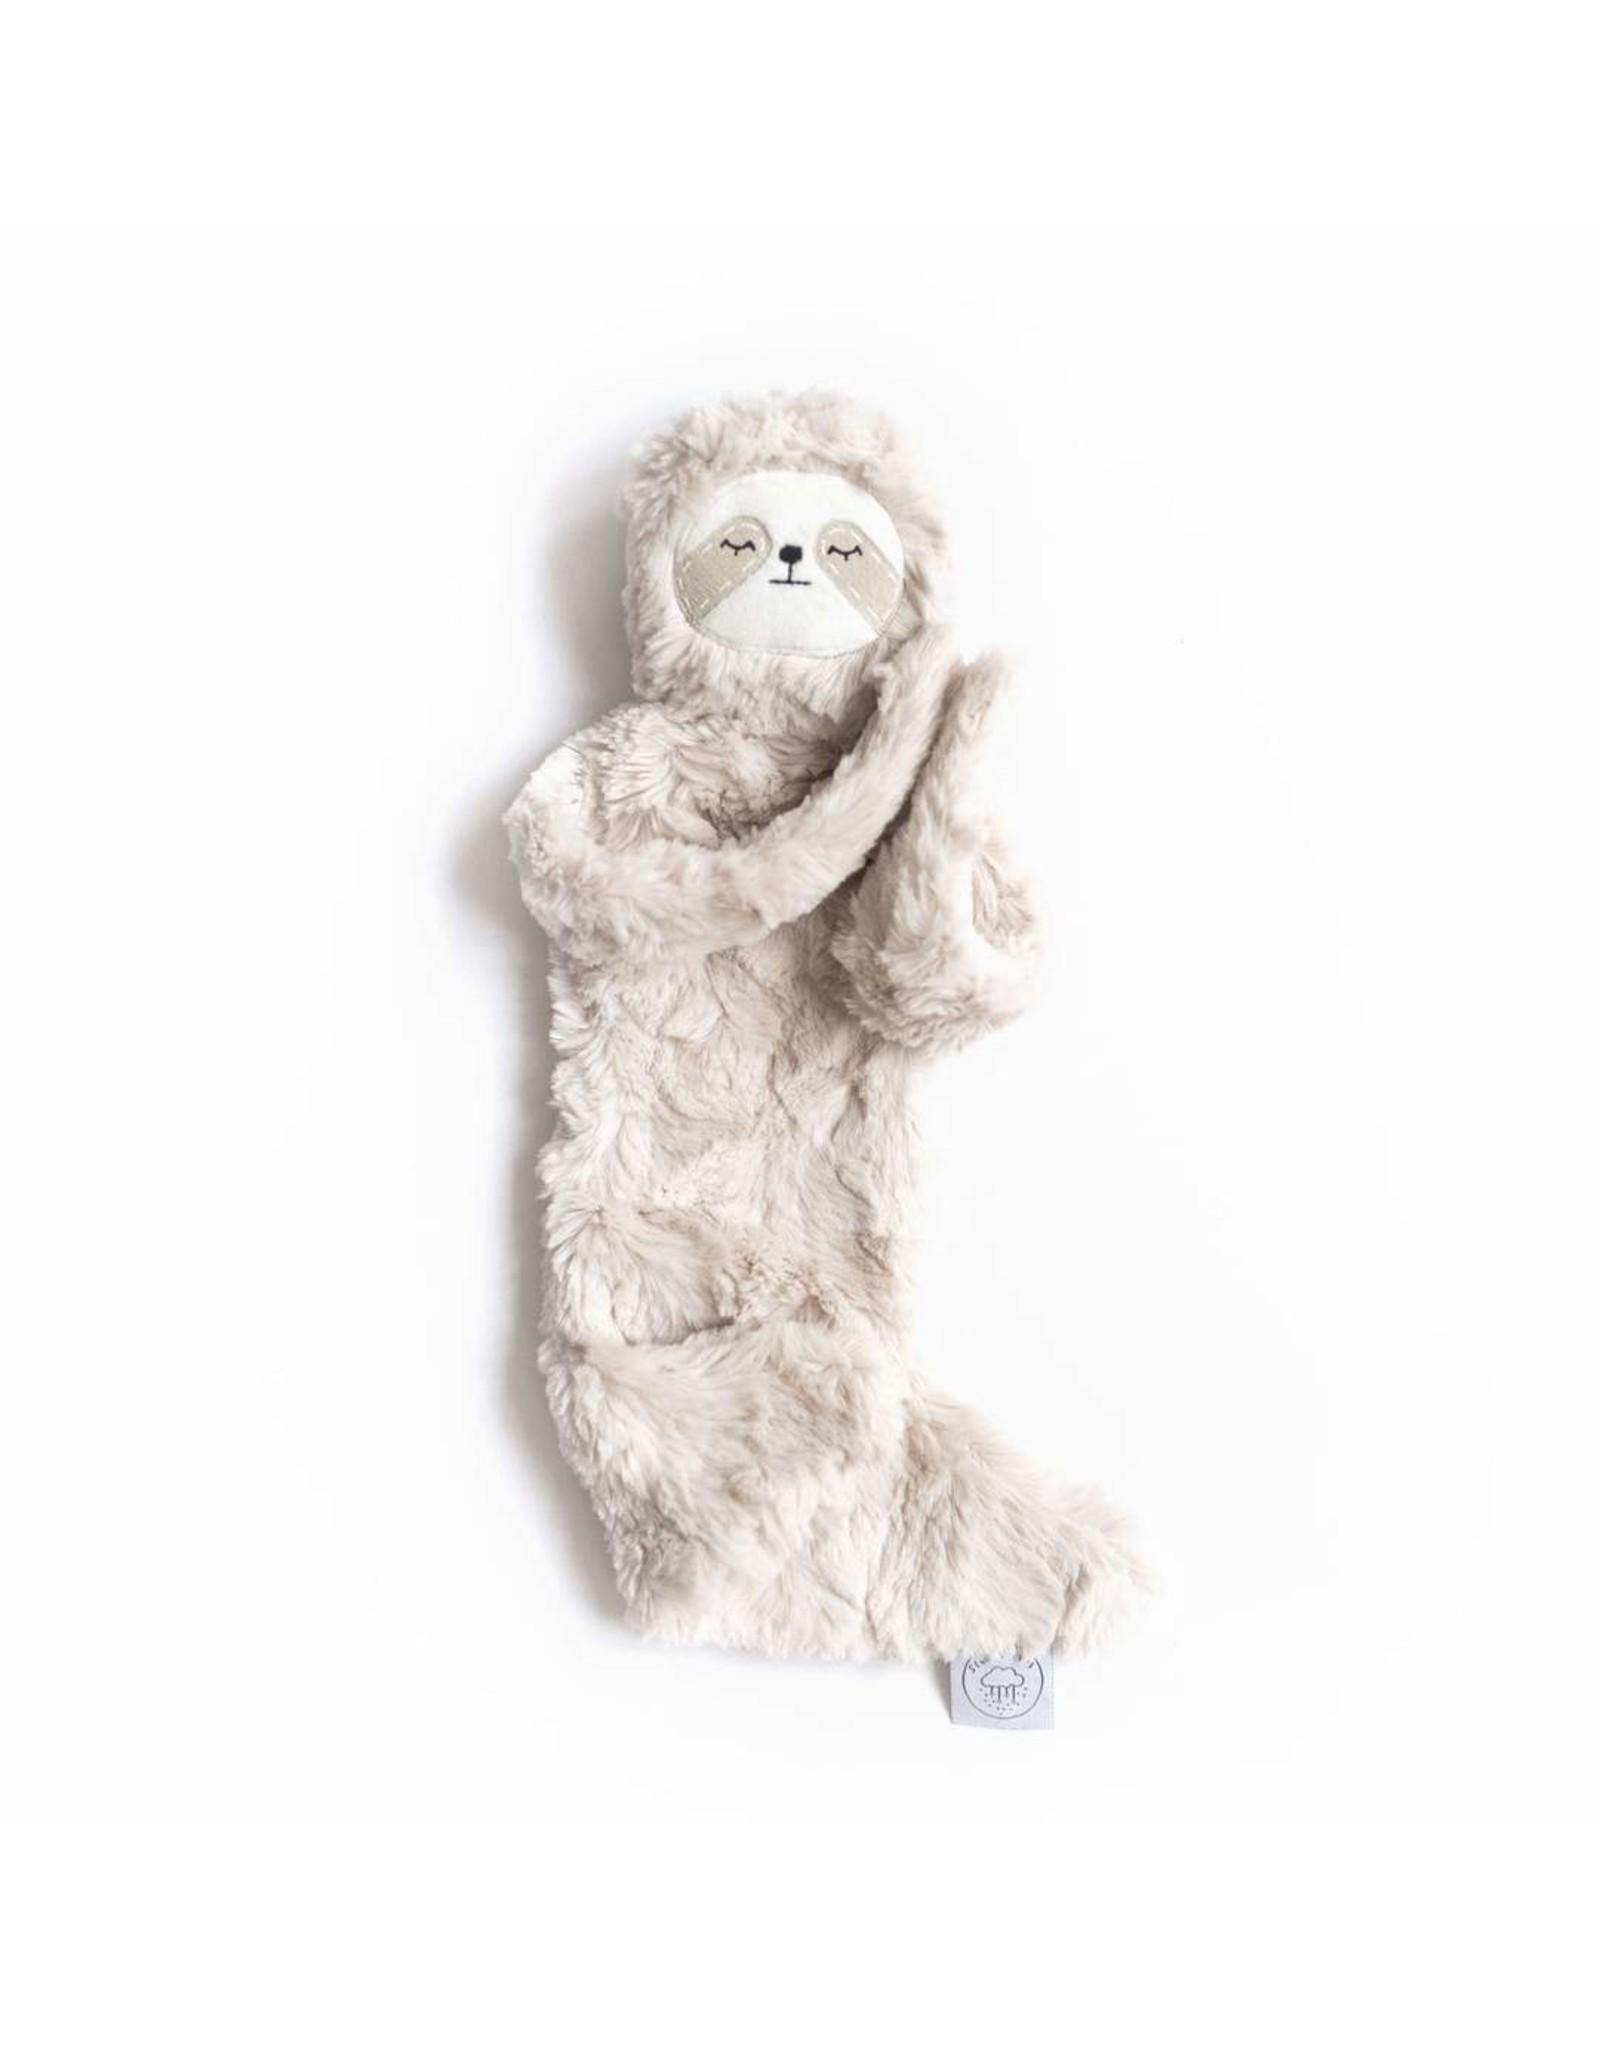 Slumberkins Sloth Snuggler Creature Full of Feels | Slumberkins